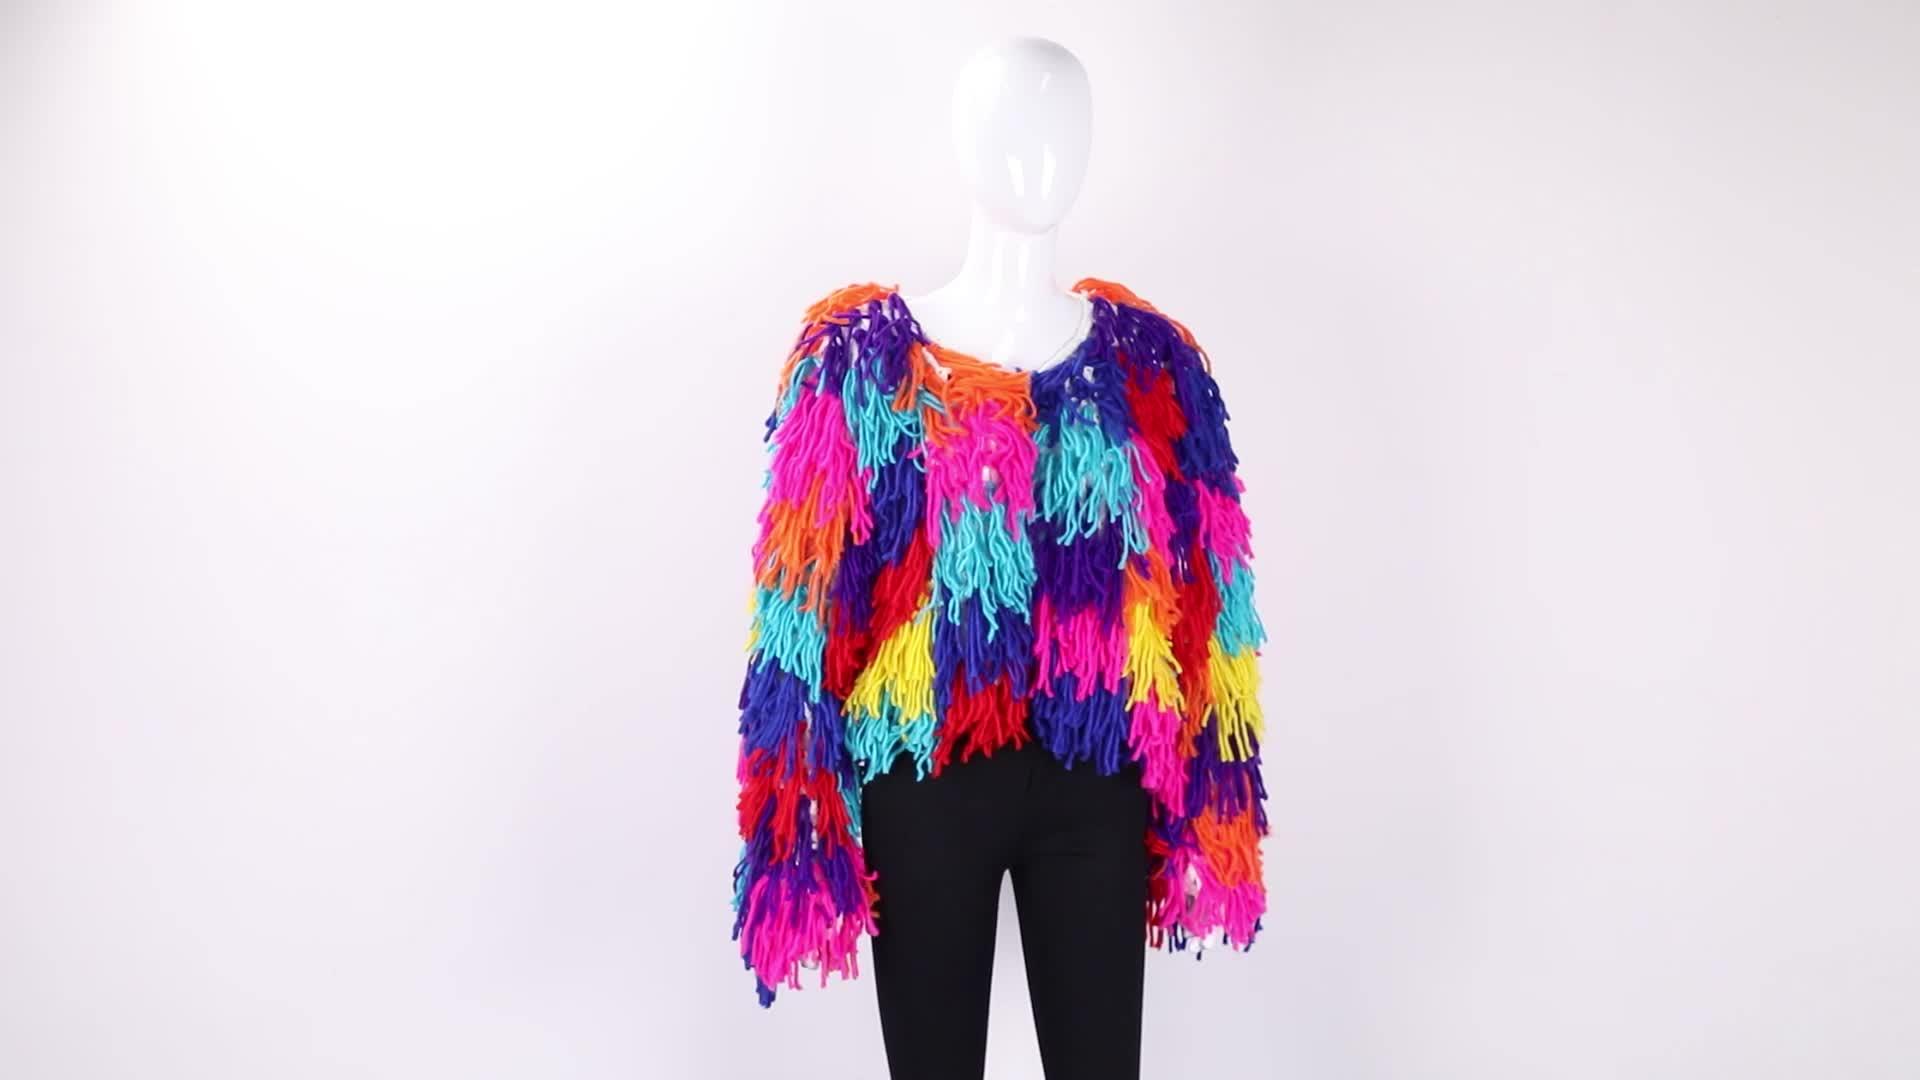 Christmas party fringed cardigan knitted Sweater factory wholesale custom women rainbow handmade crochet plush tassel cardigan